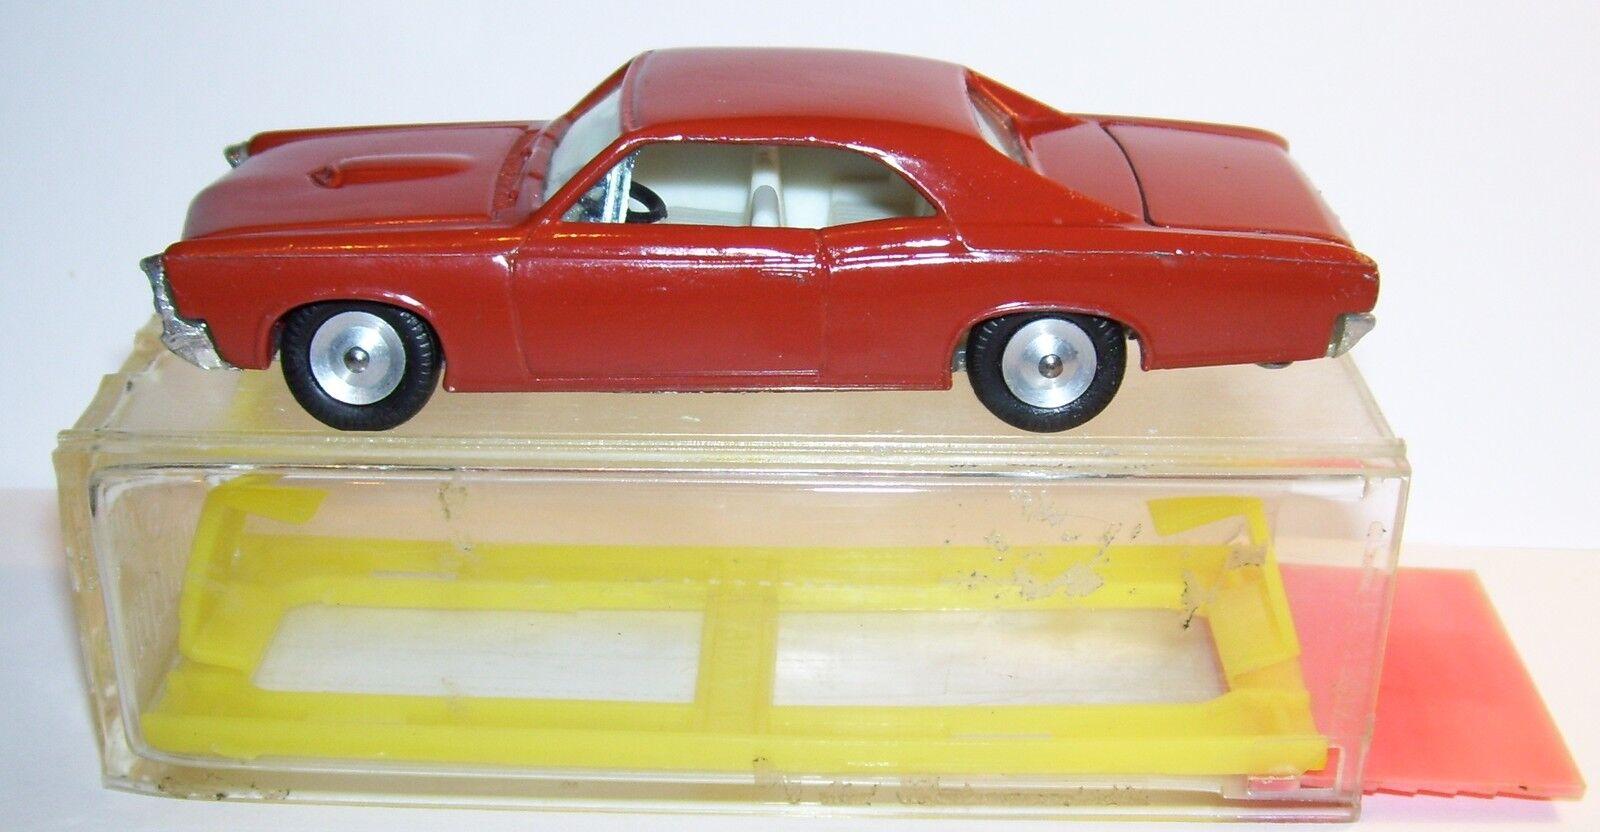 OLD RARE GAMDA KOOR SABRA  idem CRAGSTAN PONTIAC GTO 1969 REF 8107 ISRAEL IN BOX  prix bas 40%